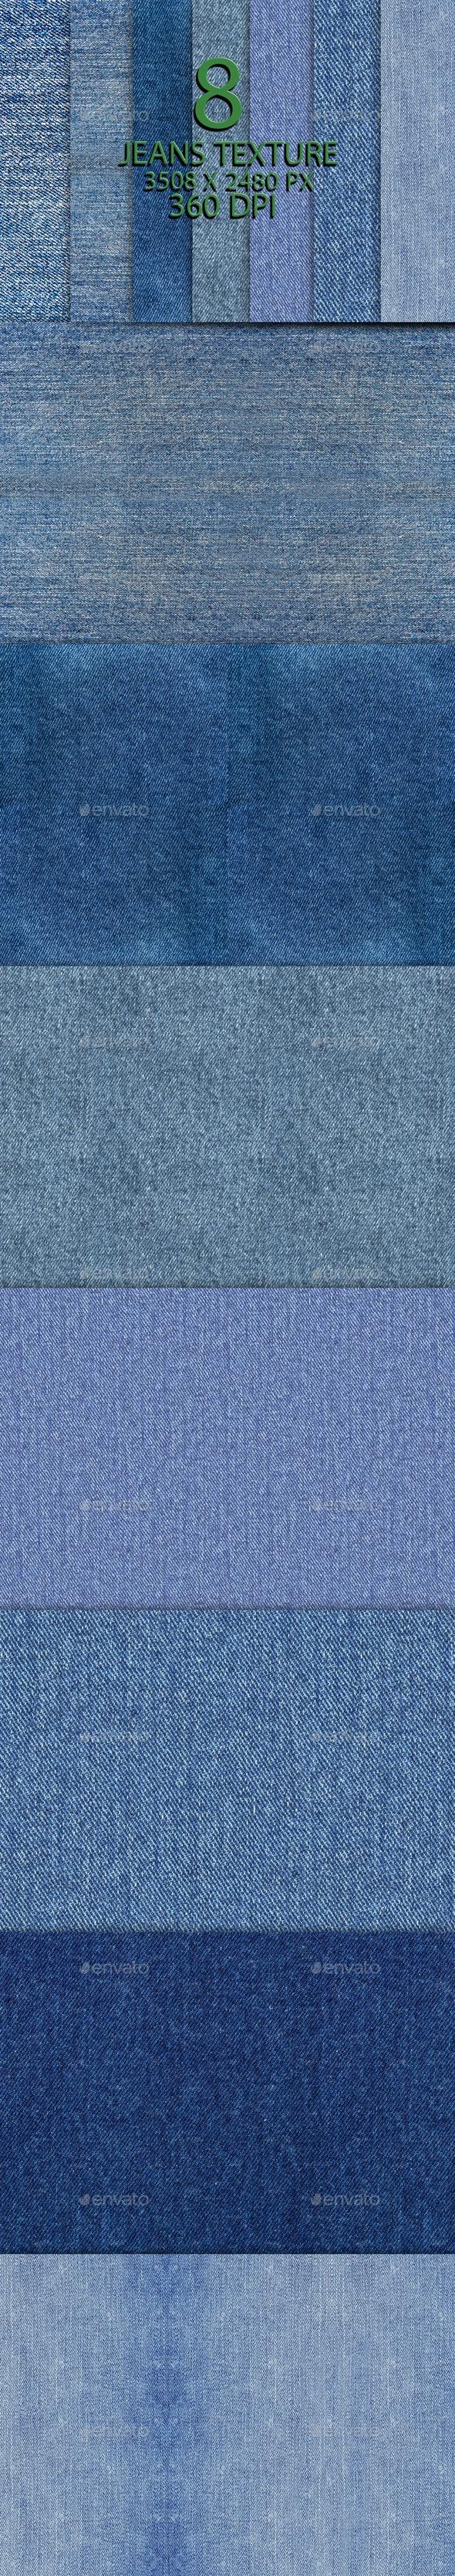 8 Jeans Texture Background Part - Backgrounds Graphics